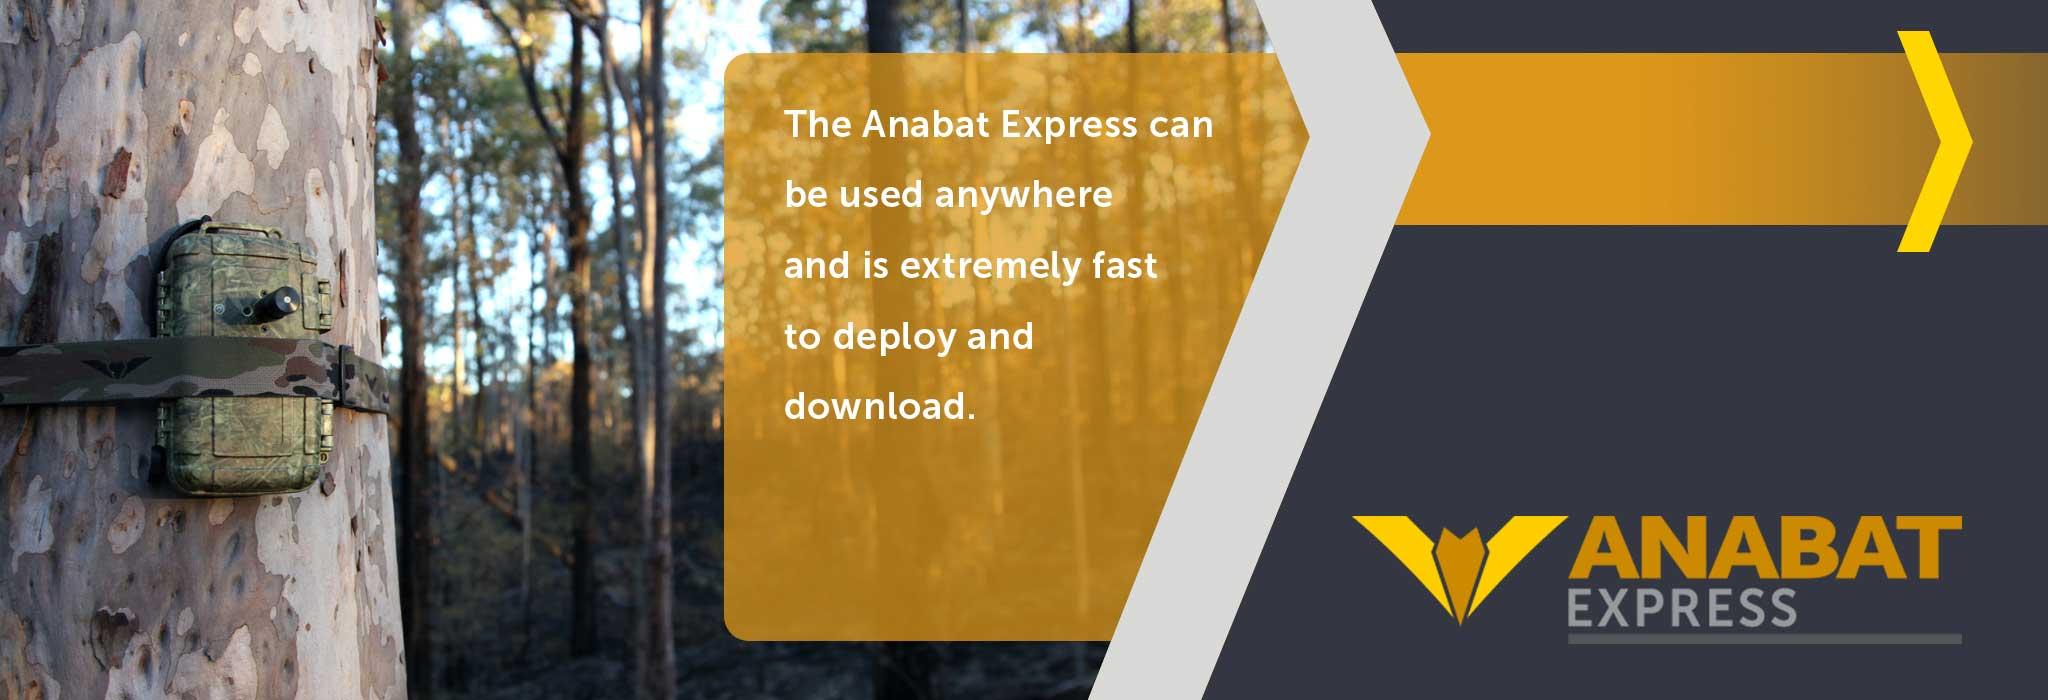 Anabat sd2 user